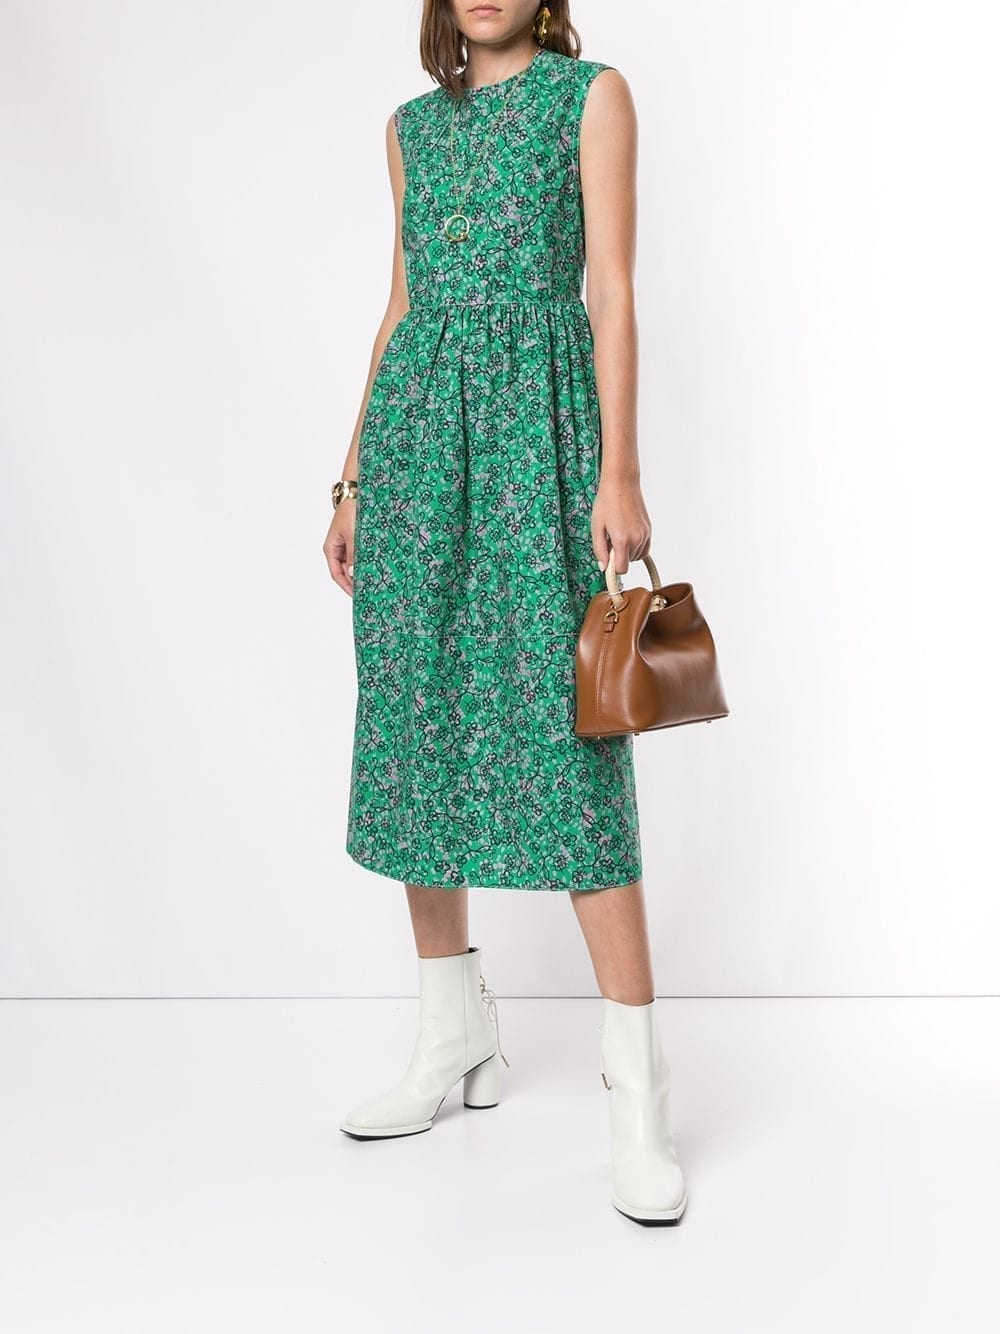 MARNI Sleeveless Floral Print Dress